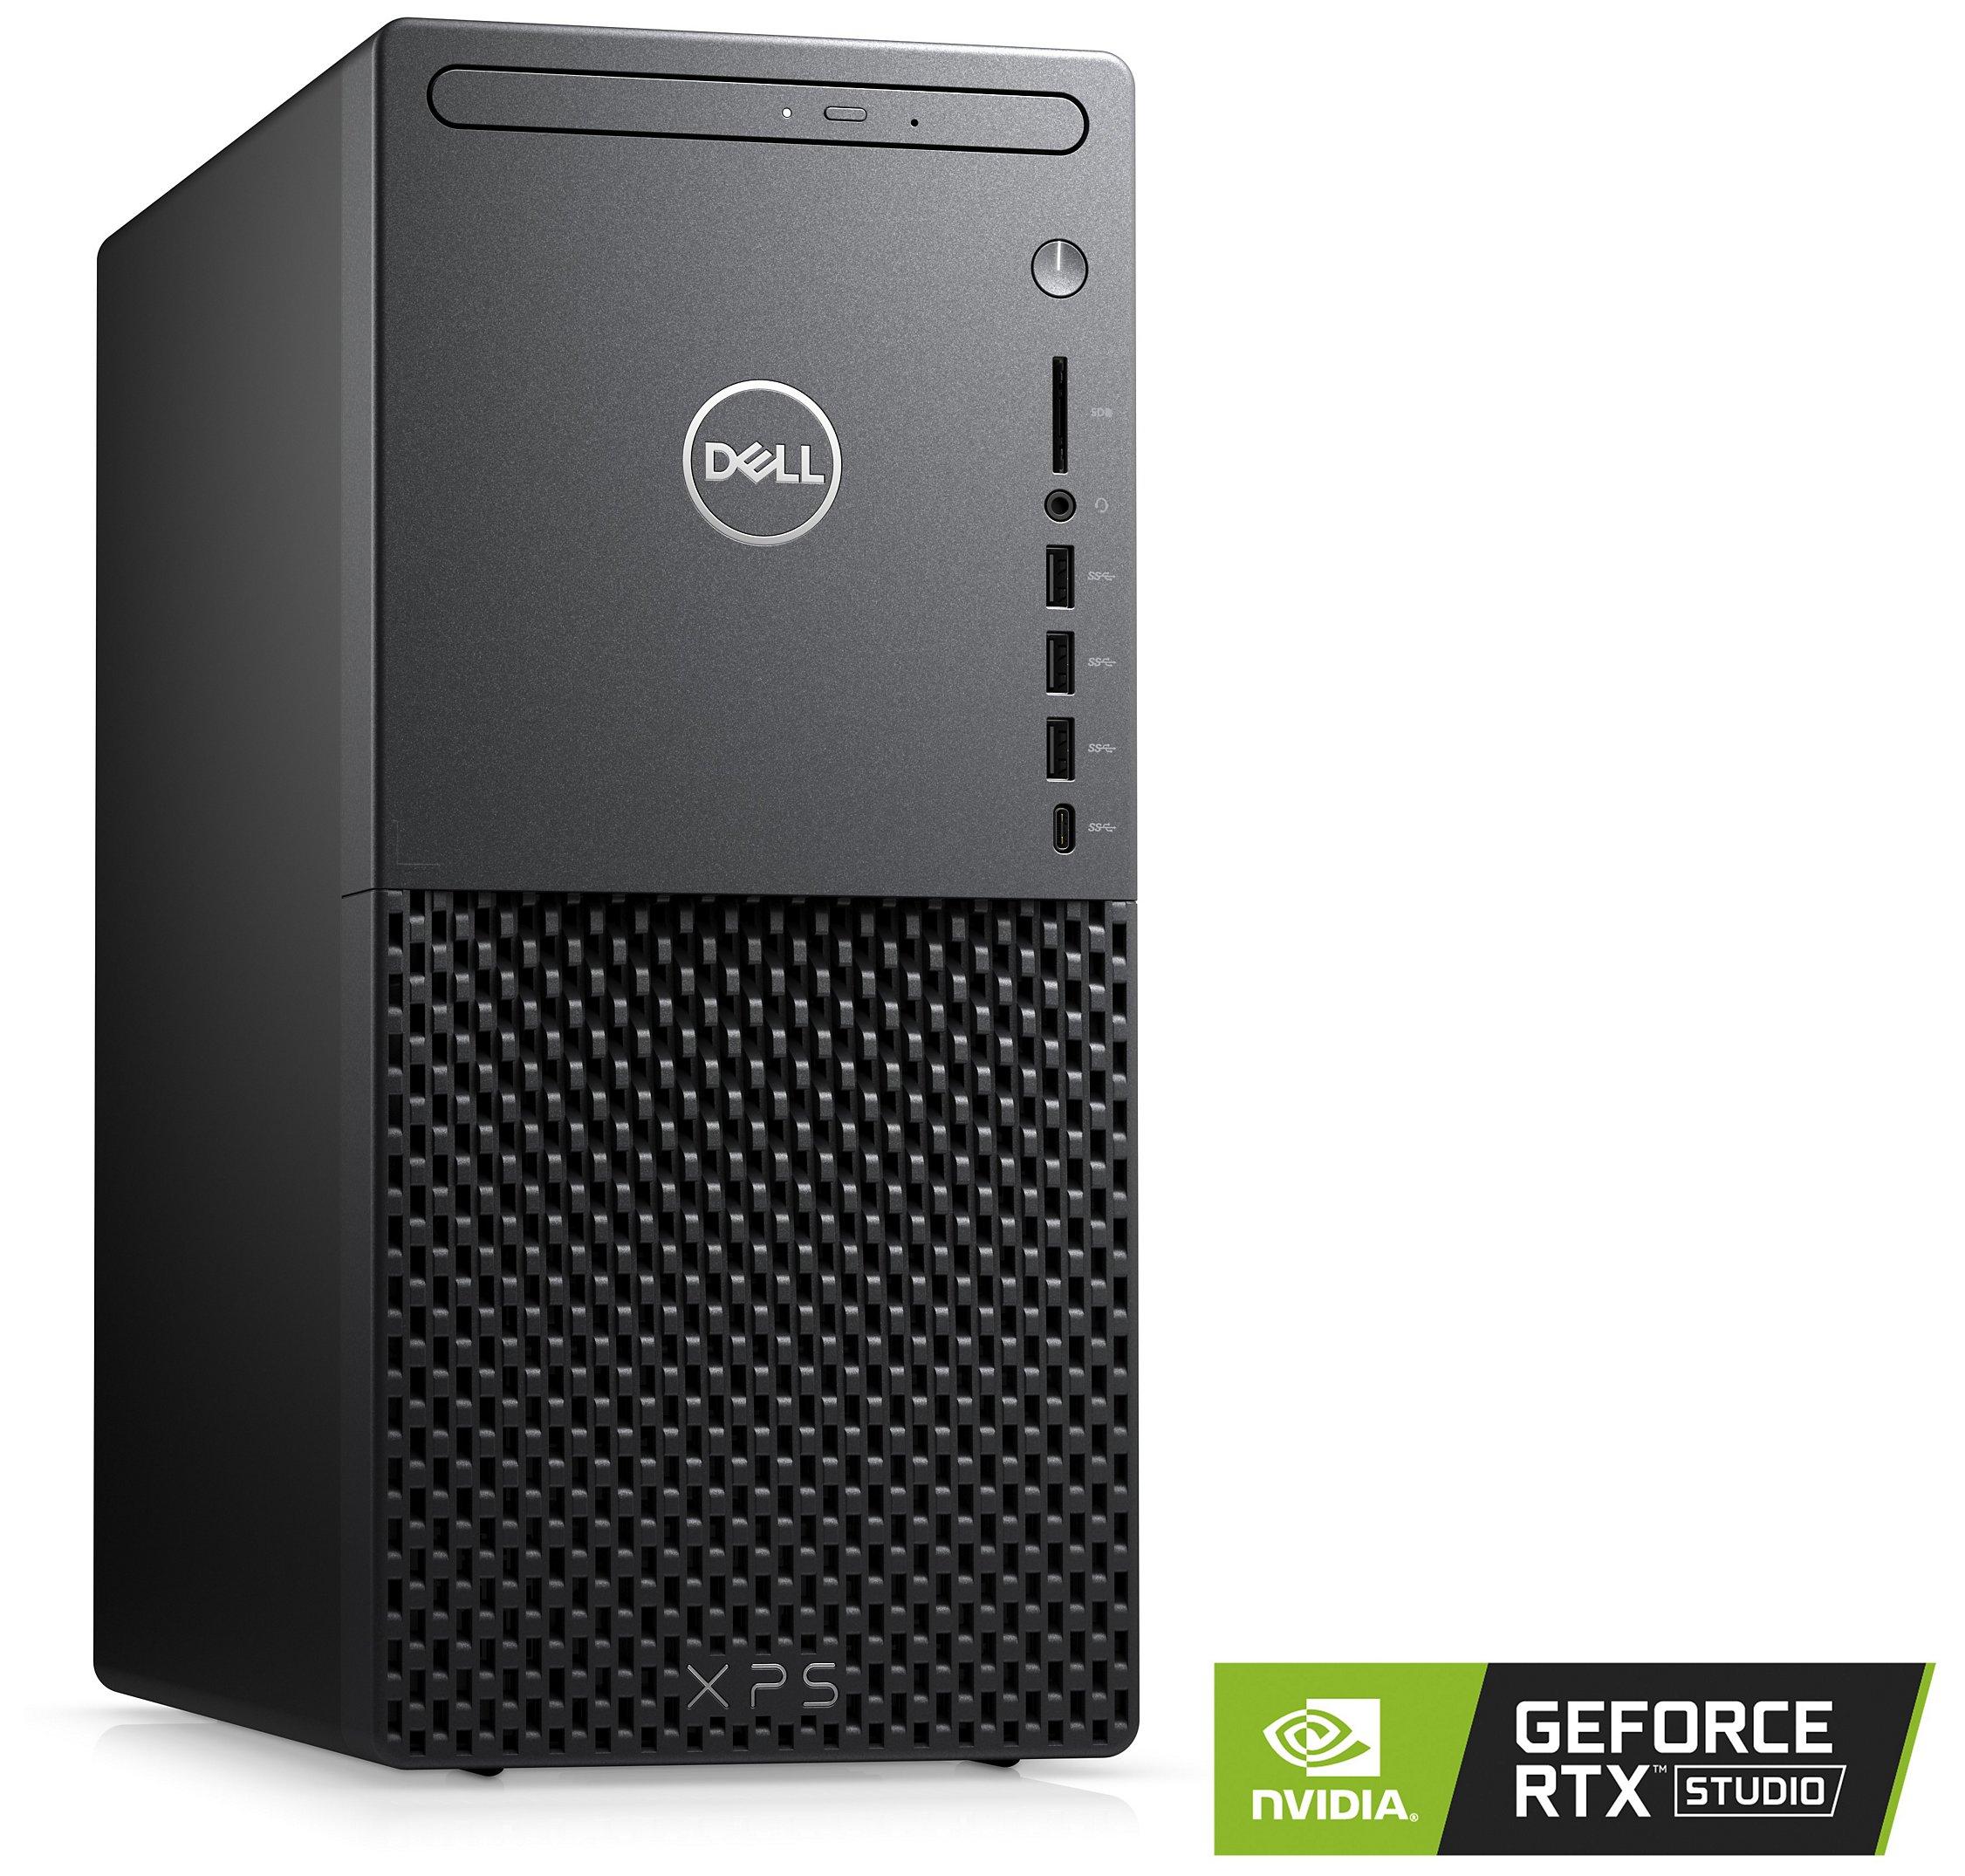 Tour PC Dell XPS - i7-11700, RTX 3060 Ti, 16 Go RAM, 512 Go SSD + 1 To HDD